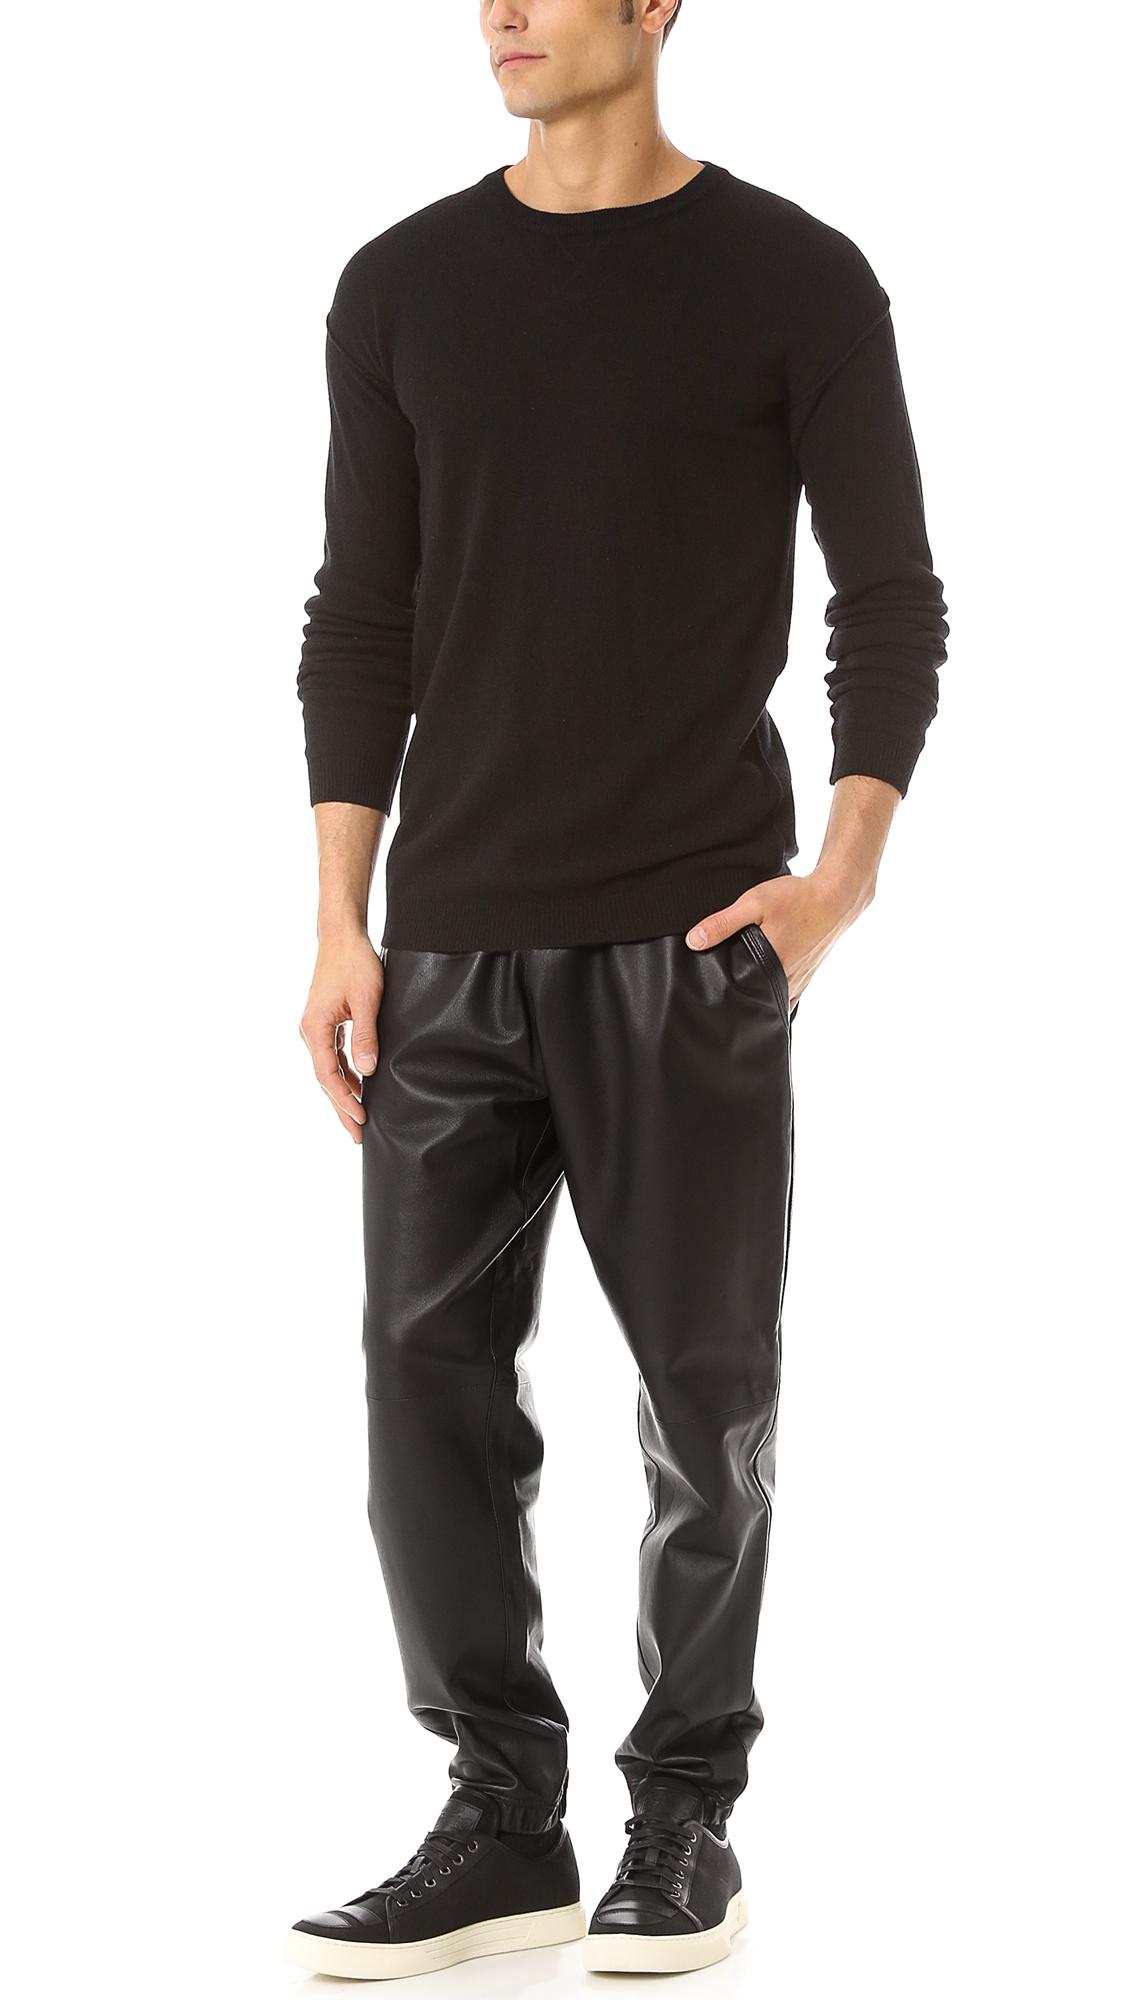 Mens leather sweatpants